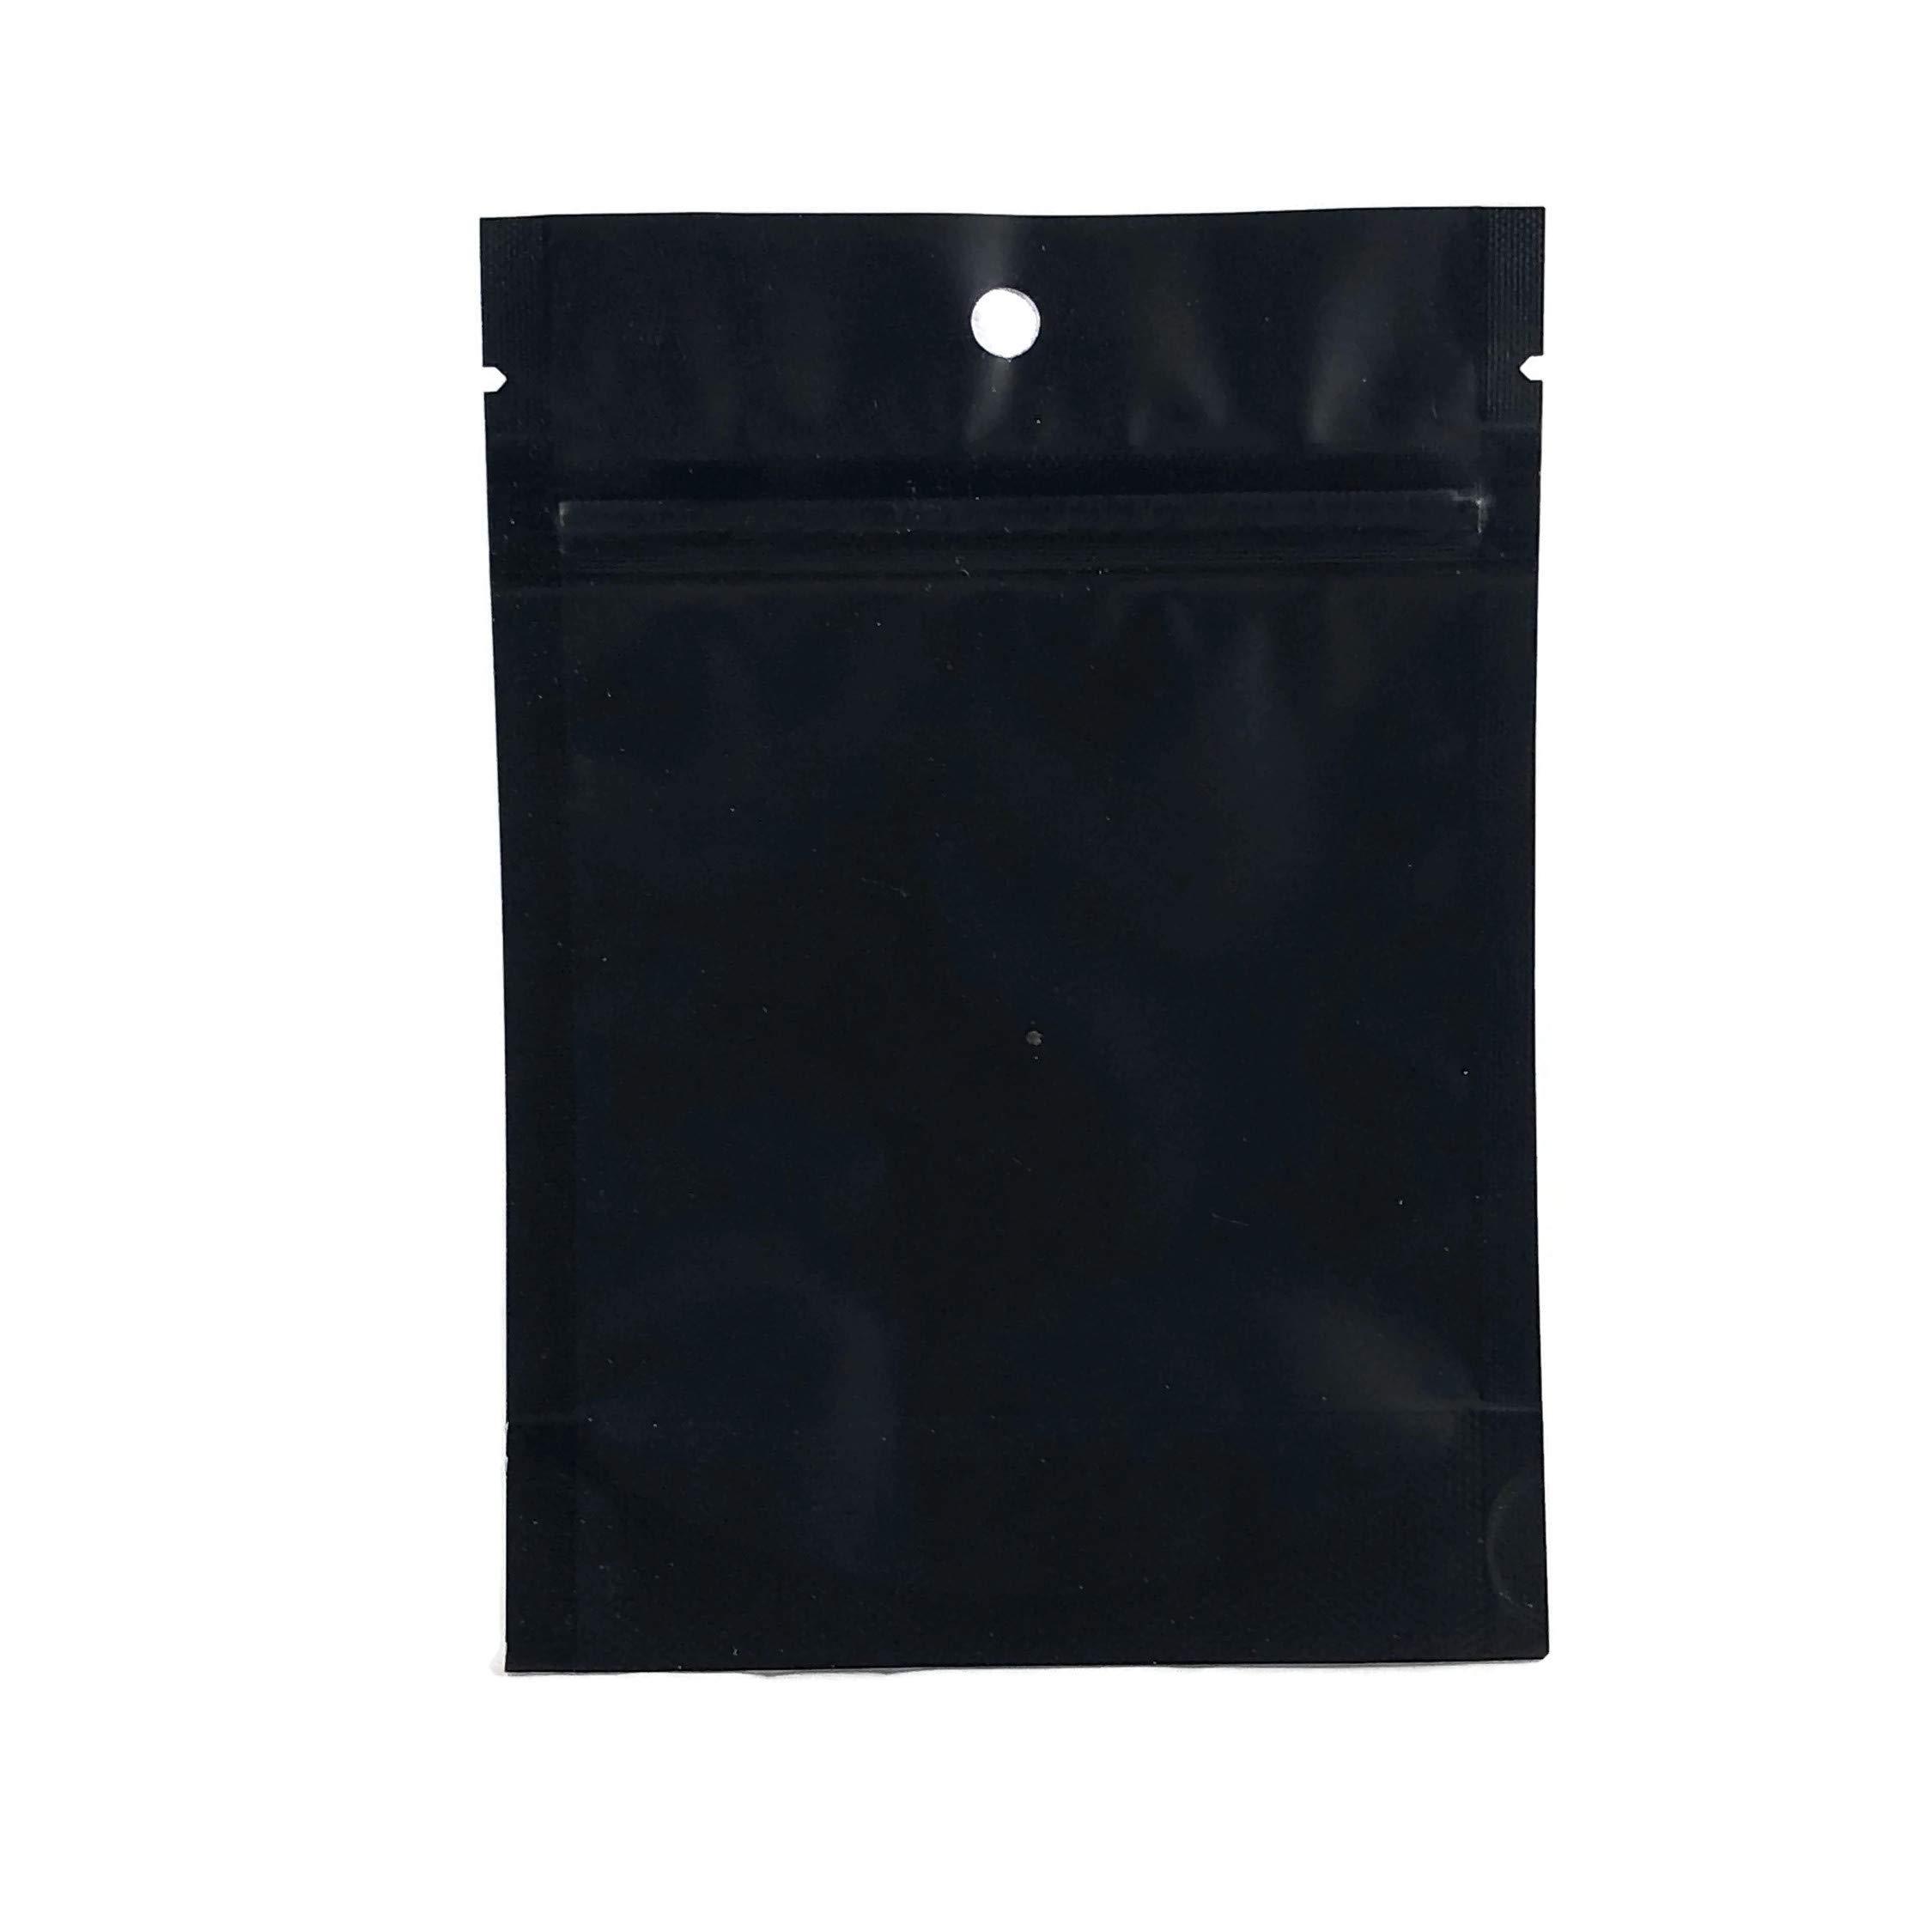 BISCOTTI Stickers & Mylar Barrier Bag - 3.5 GRAM - Heat Sealable - (Zip Lock Canna Bags, Billy Kimber, Paris OG) (50) by BIGSMOKE (Image #3)